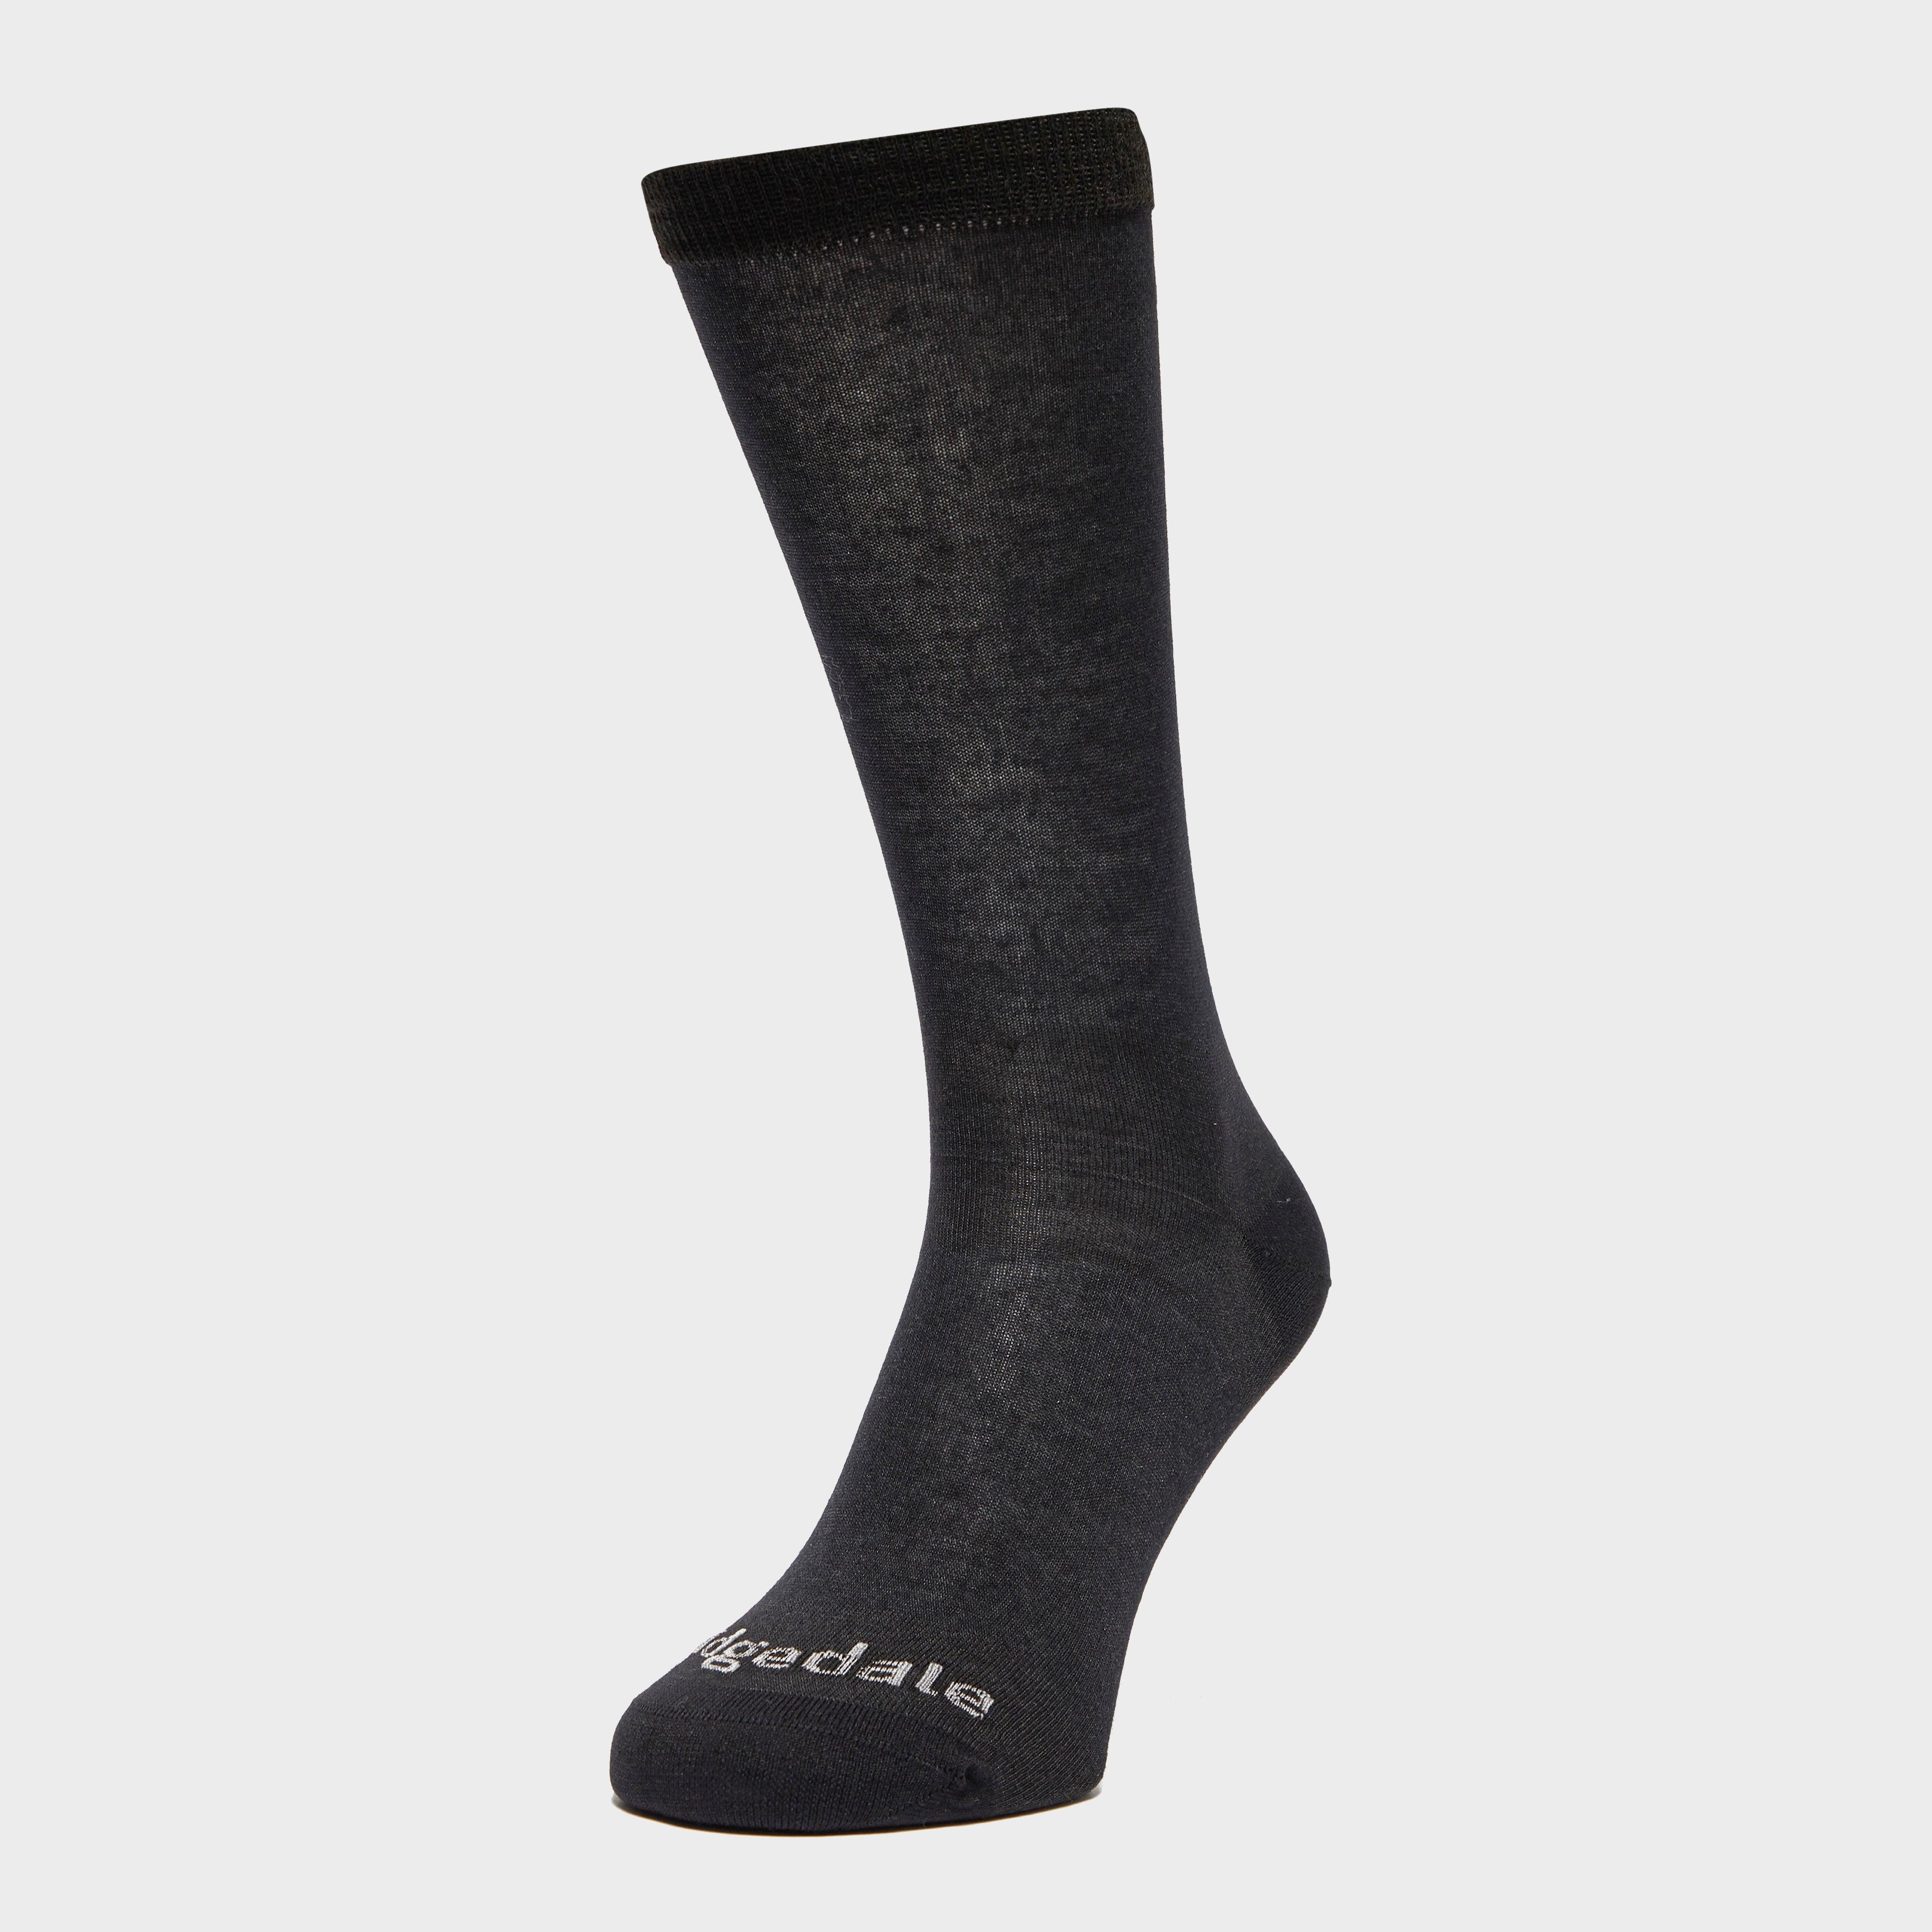 Bridgedale sokker